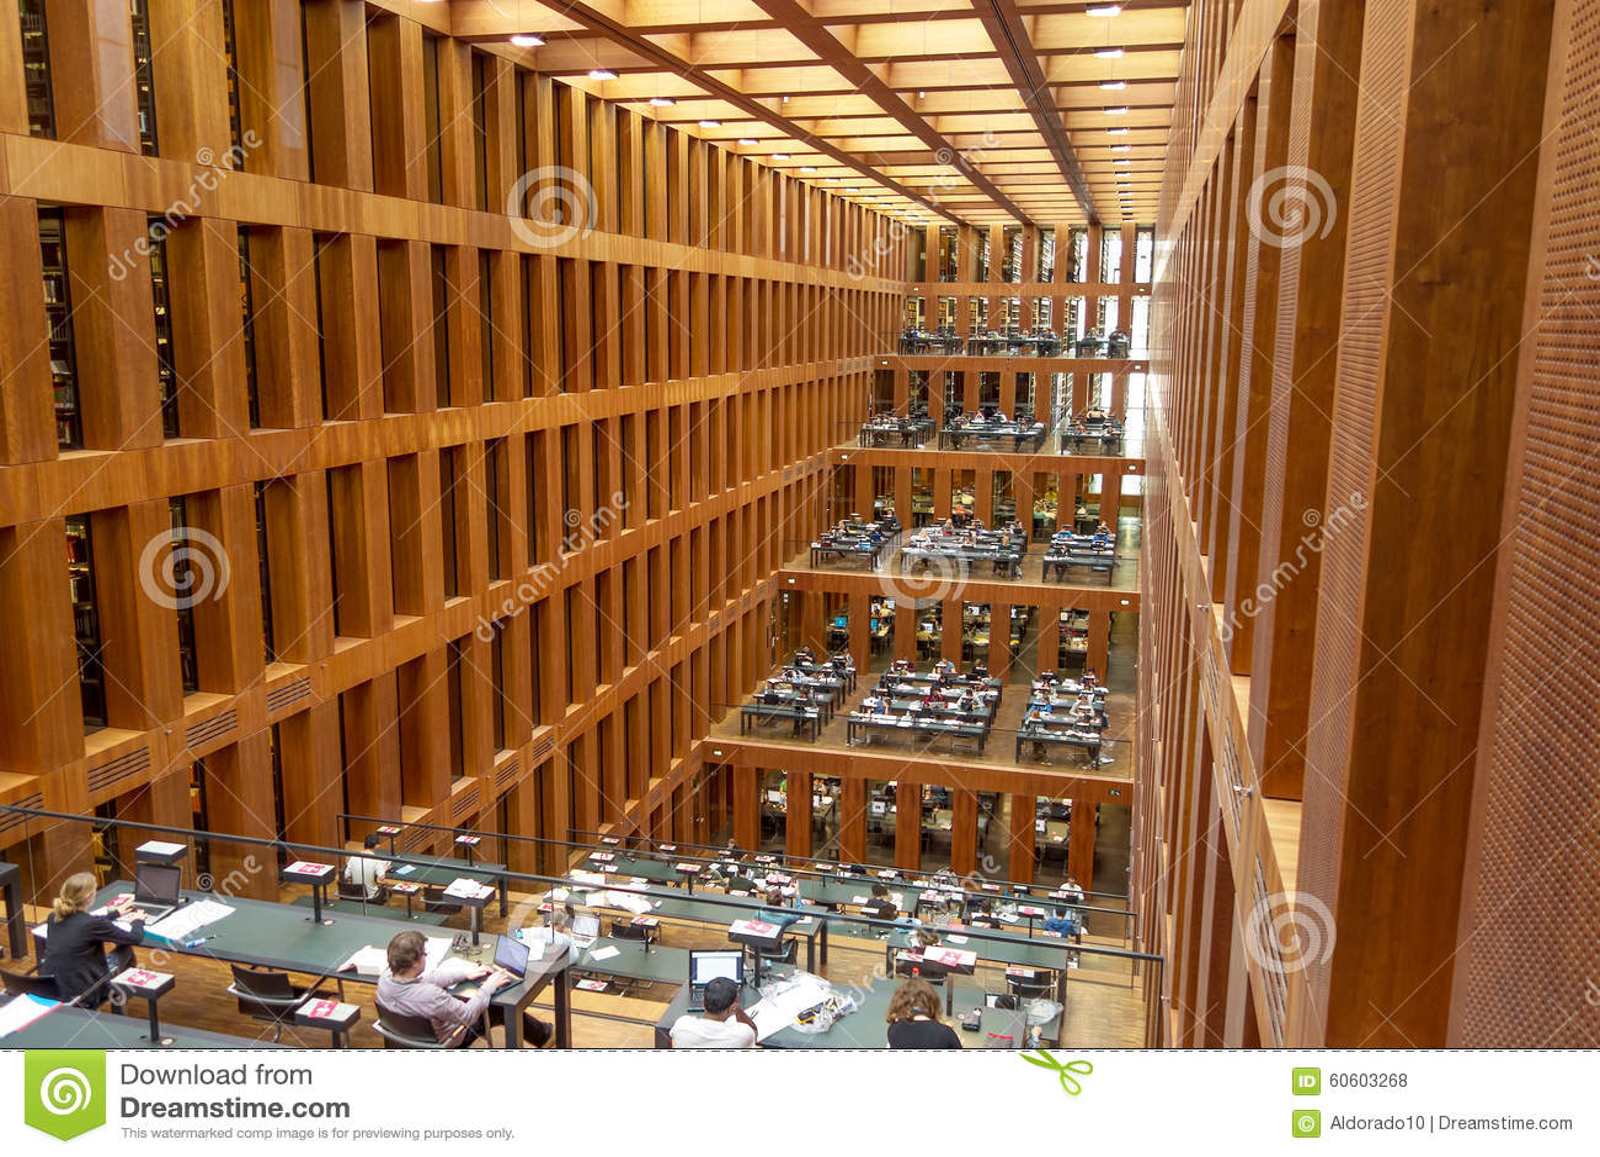 Humboldt University Library in Berlin